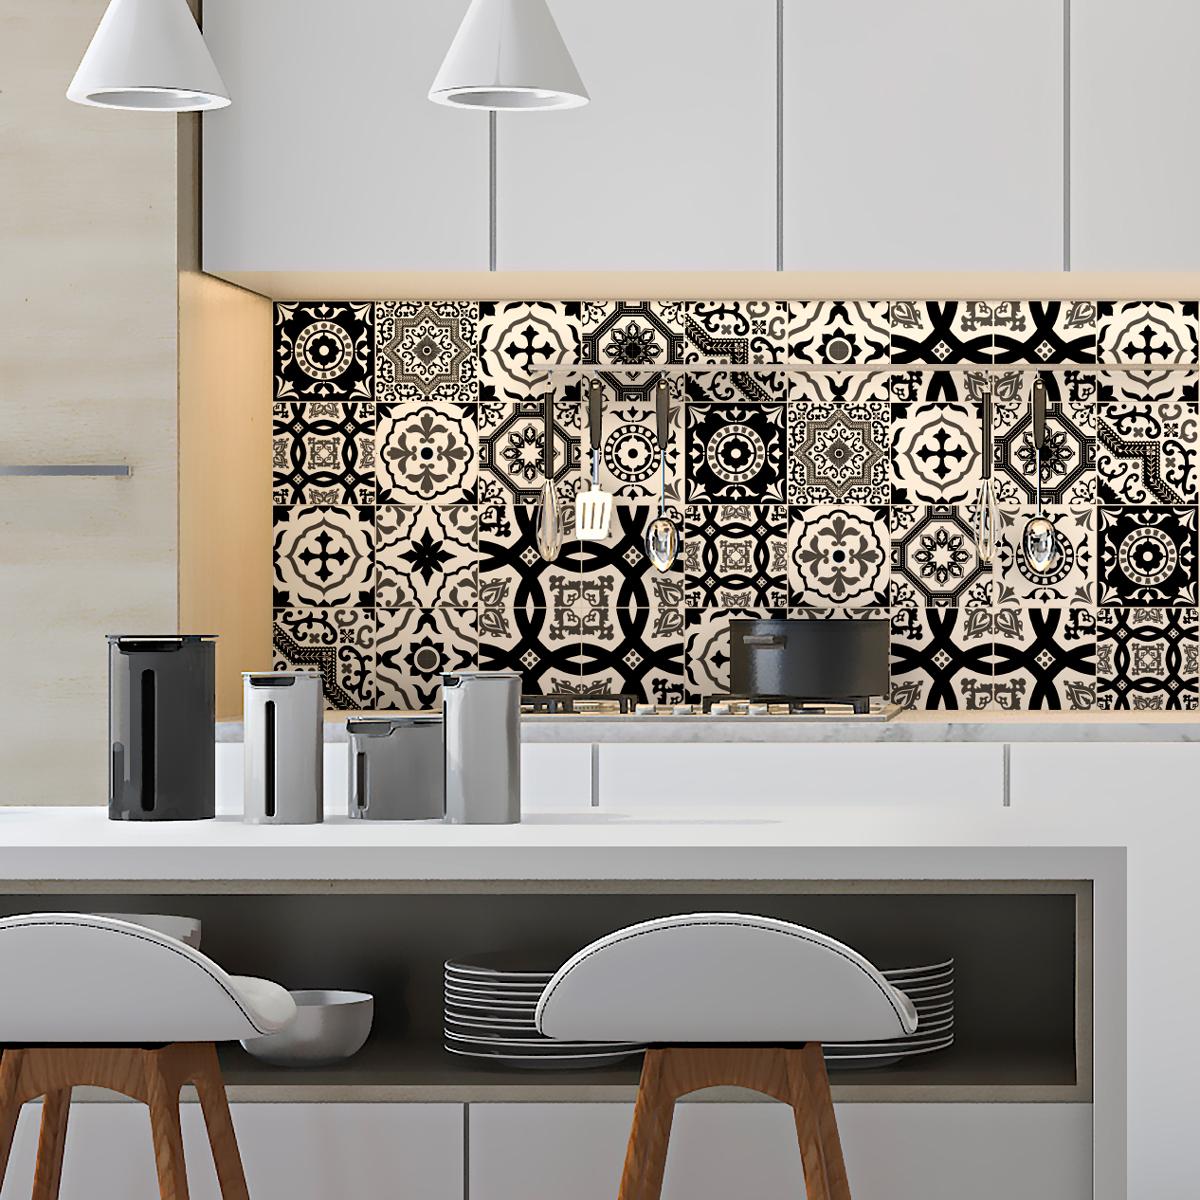 16 stickers carrelages azulejos modernes nuance noir et blanc art et design artistiques. Black Bedroom Furniture Sets. Home Design Ideas